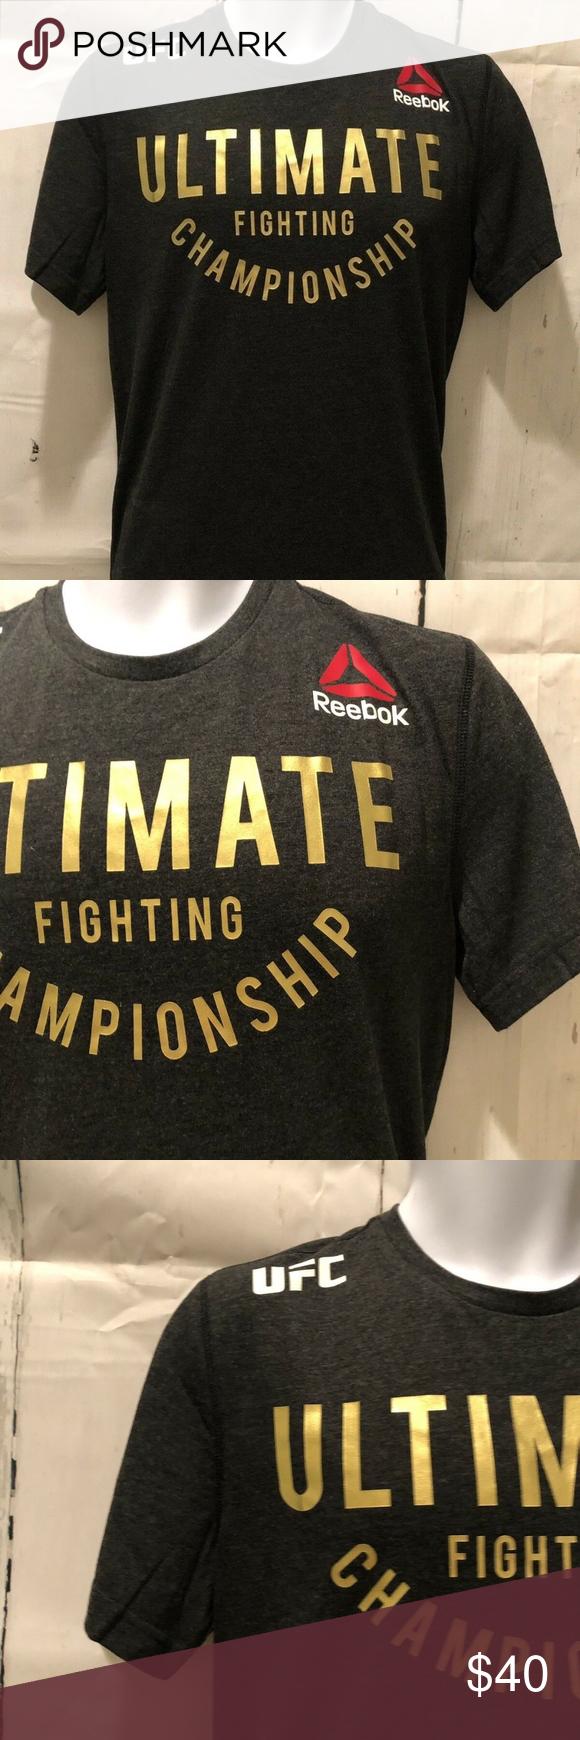 9e6d0918506e UFC Reebok TShirt Ultimate Fighting Championship M UFC Reebok TShirt  Ultimate Fighting Championship Shirt Tee Gold Detail Official - Medium  Condition: New ...